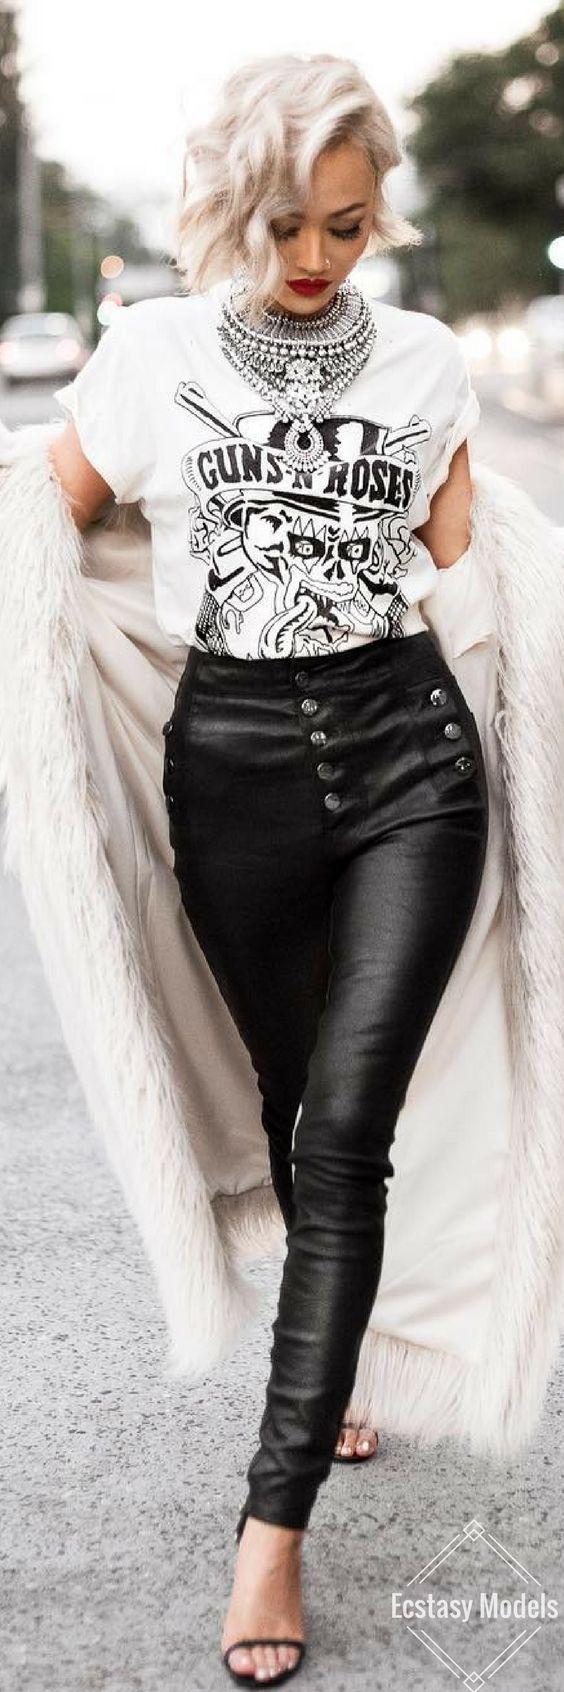 Rockstar // Fashion Look by Micah Gianneli